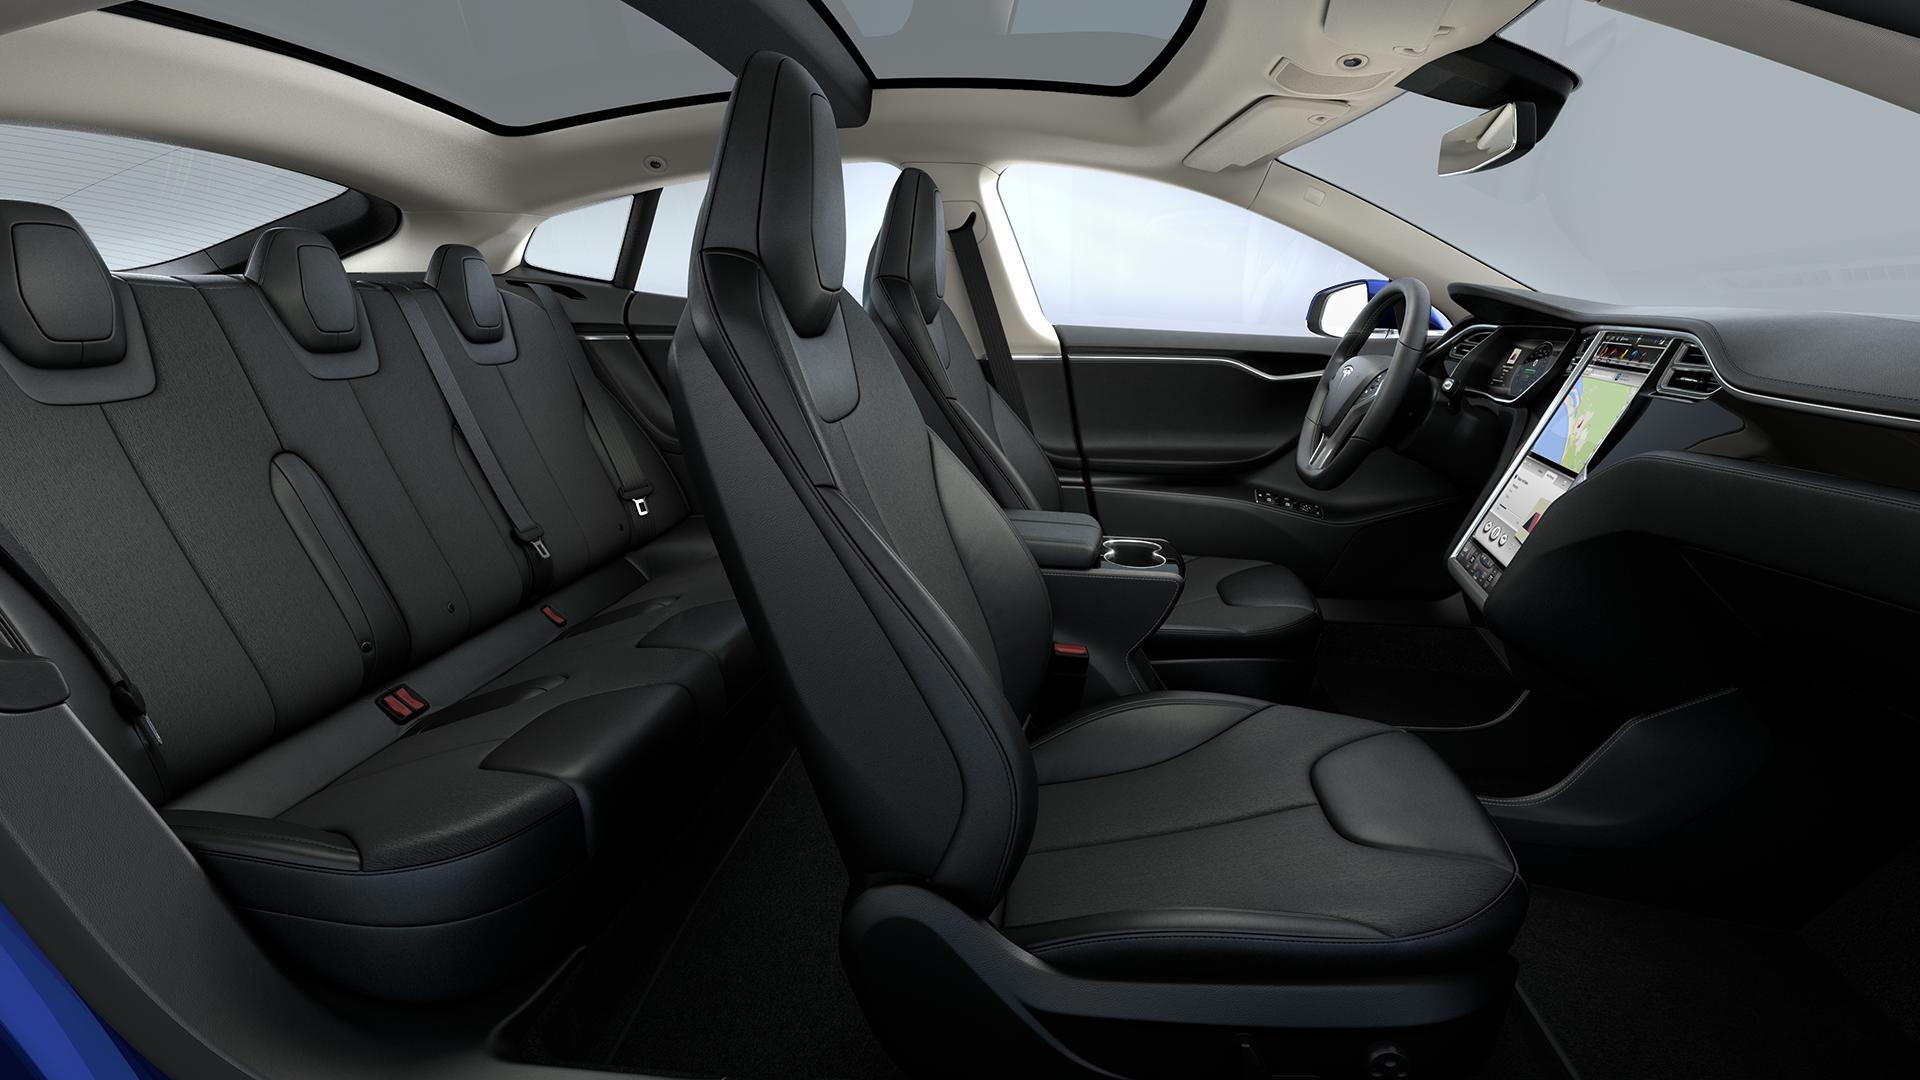 Interieur Rear Facing Seats Cream Premium Dark Ash Wood Decor Black Alcantara Headliner